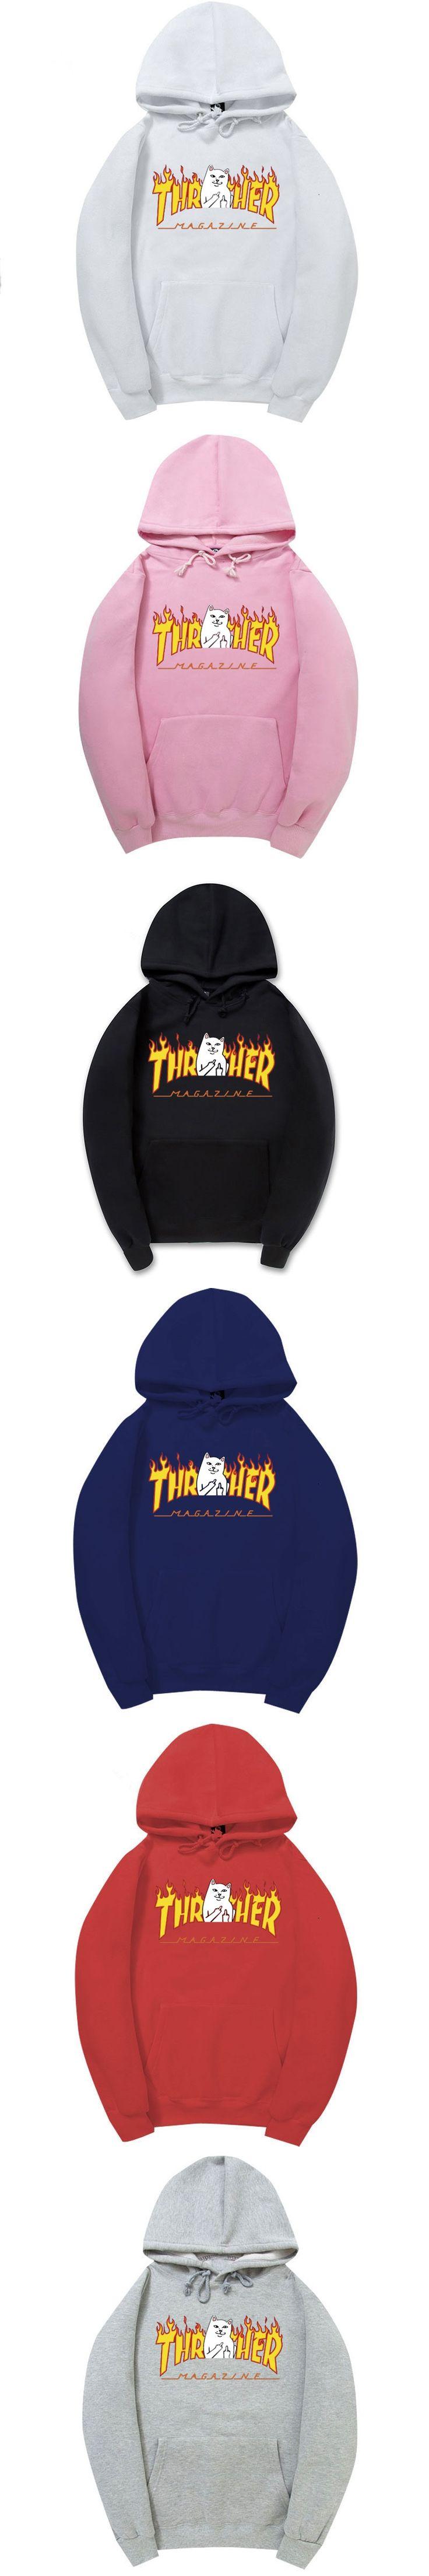 2017 New Trasher Hoodies Men/Women Fashion Printing 100% Cotton 1:1 Casual Sweatshirts Summer Skateboard Tee Boy Skate Hoodies